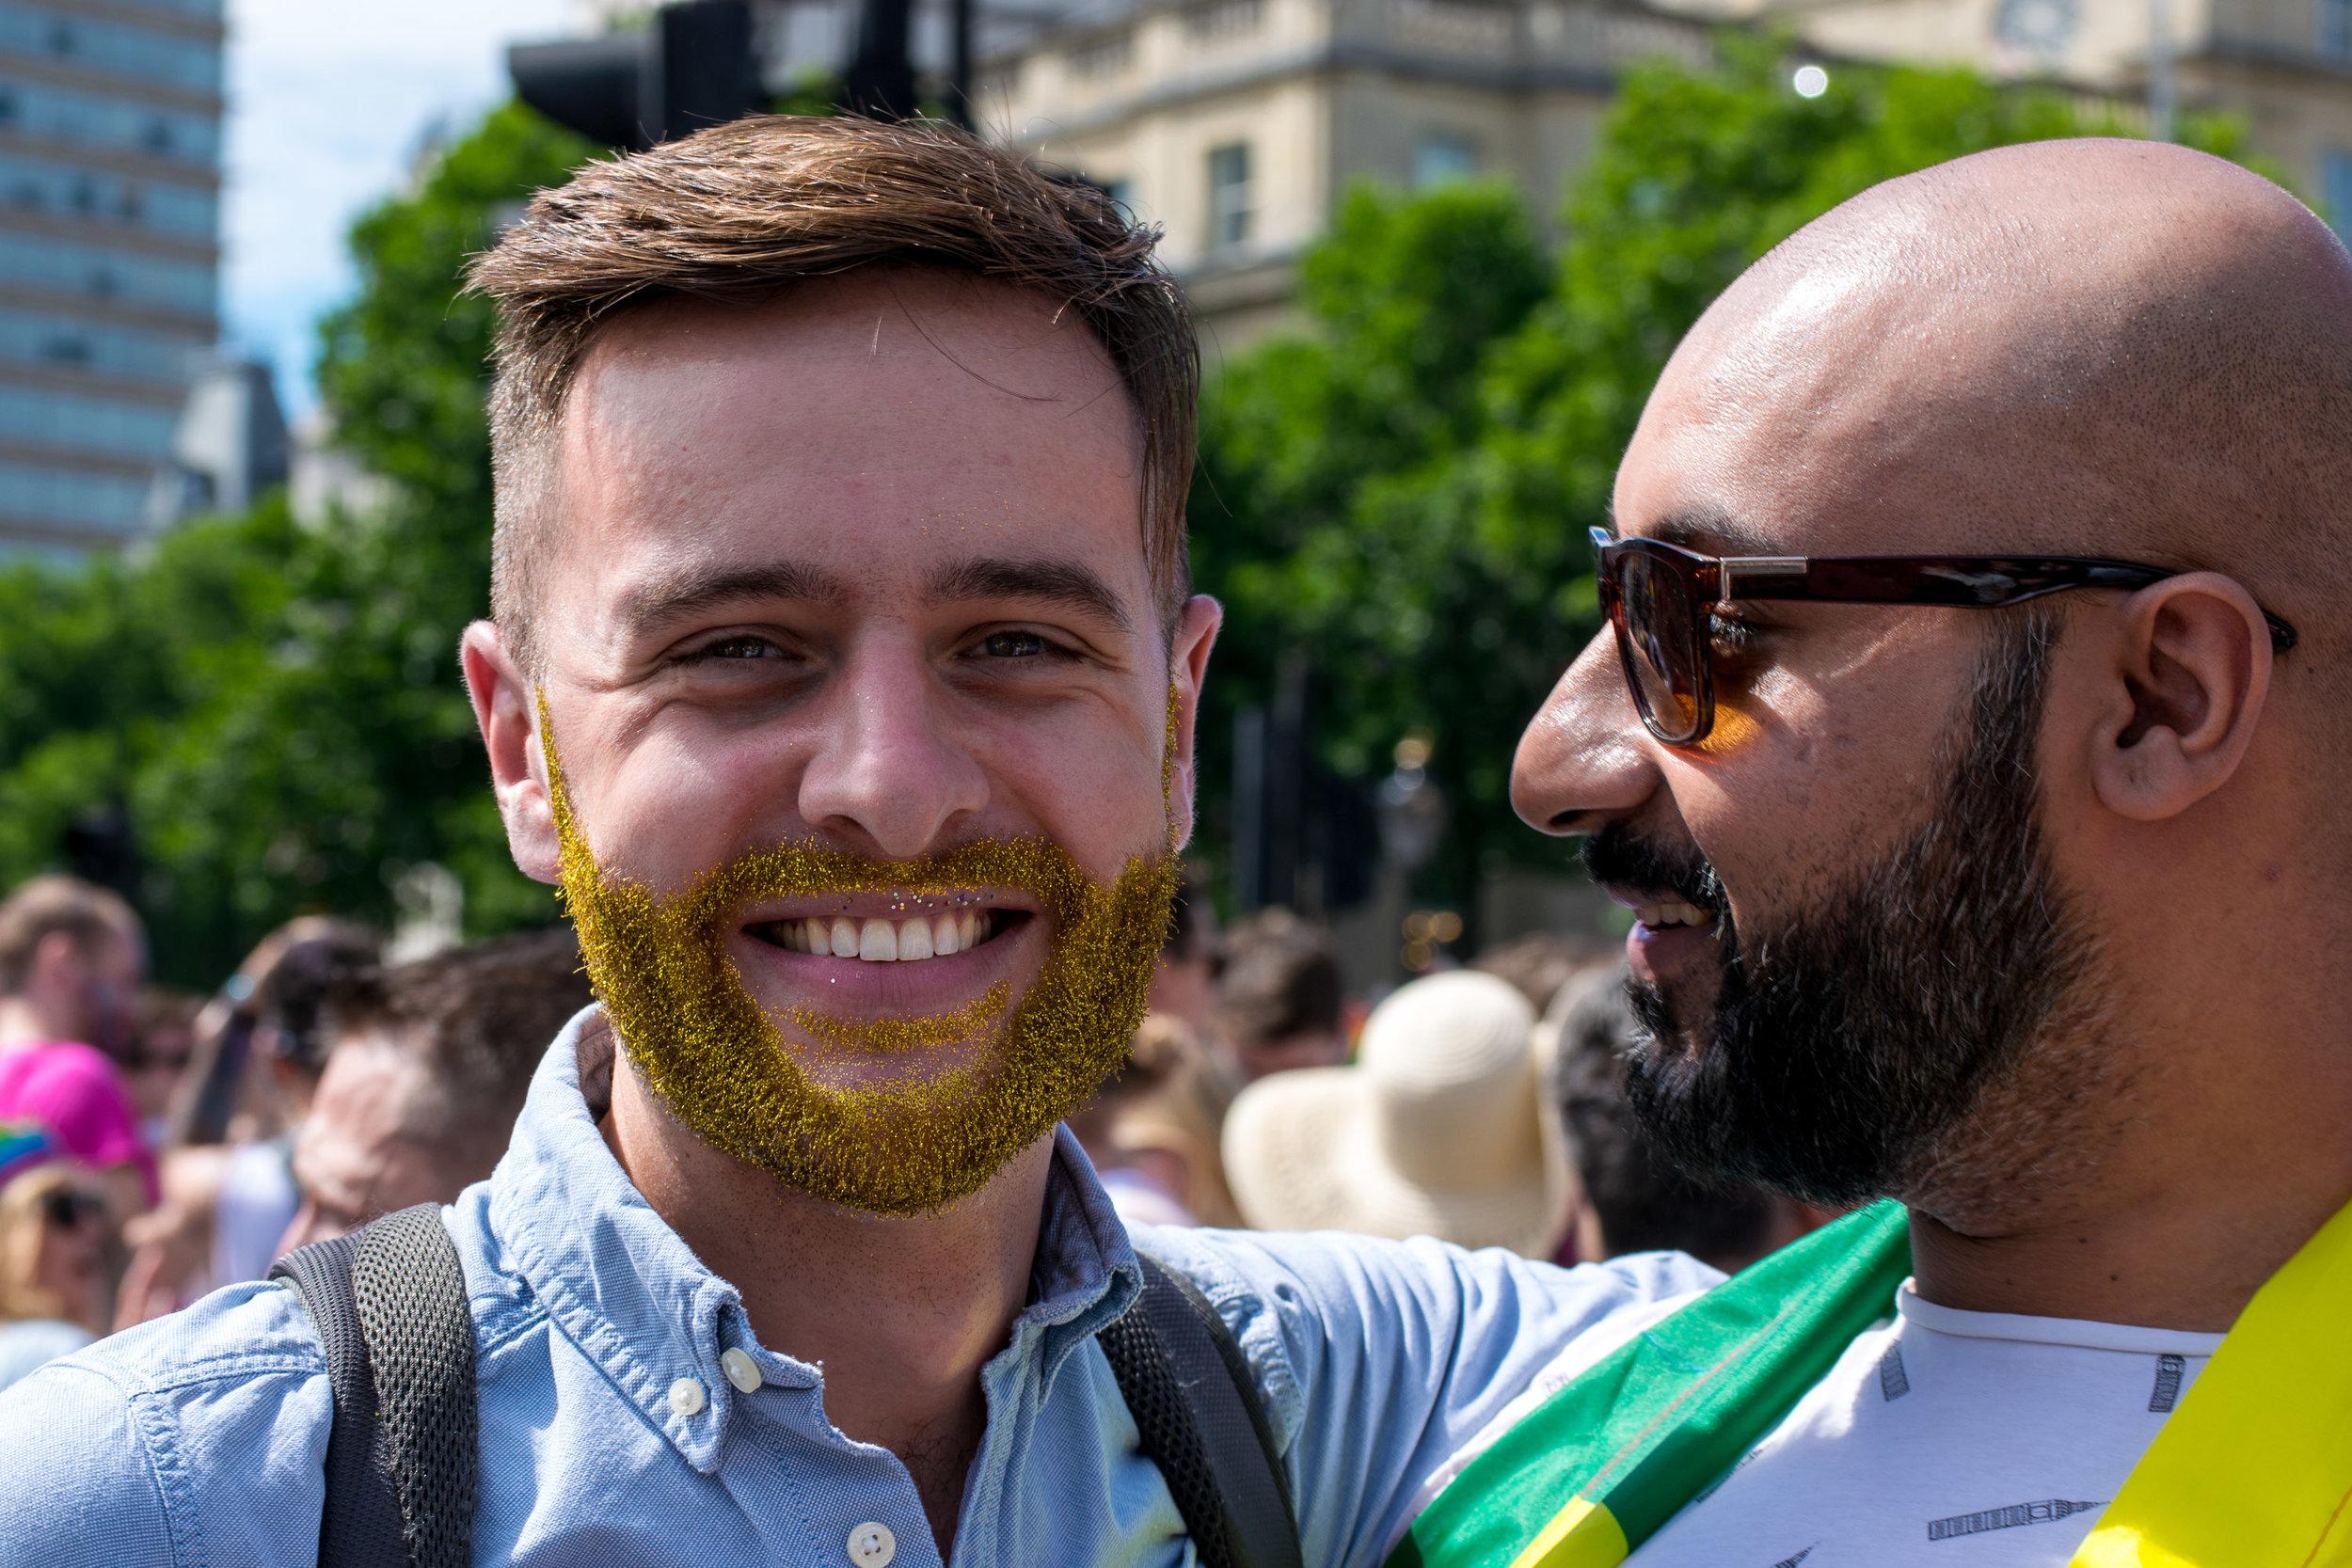 PrideLondon-08Jul2017-064.jpg